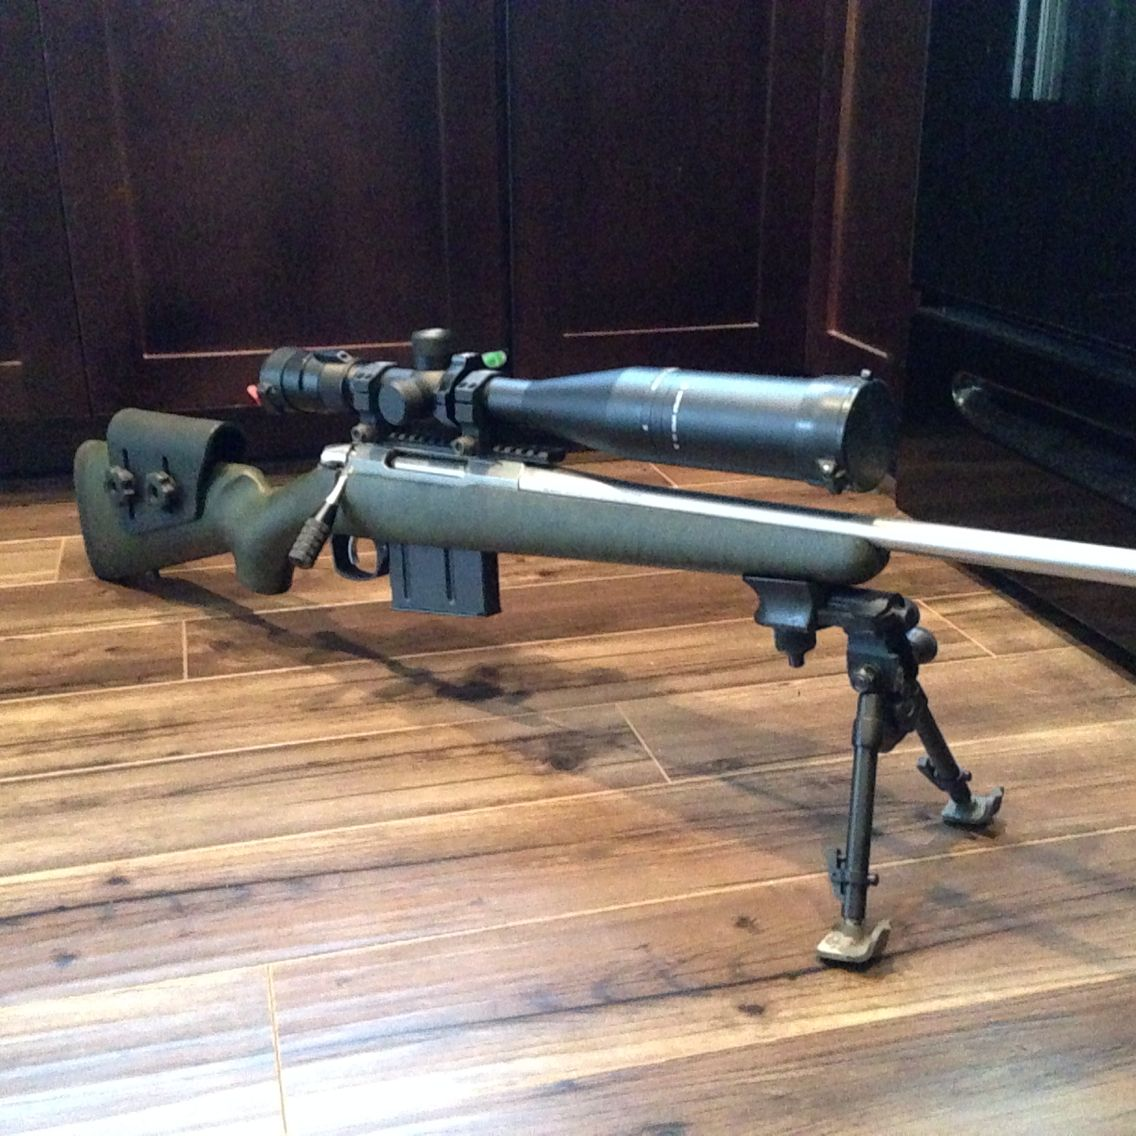 Pin by J C on 2nd Amendment   Guns, Hunting rifles, Rifle scope